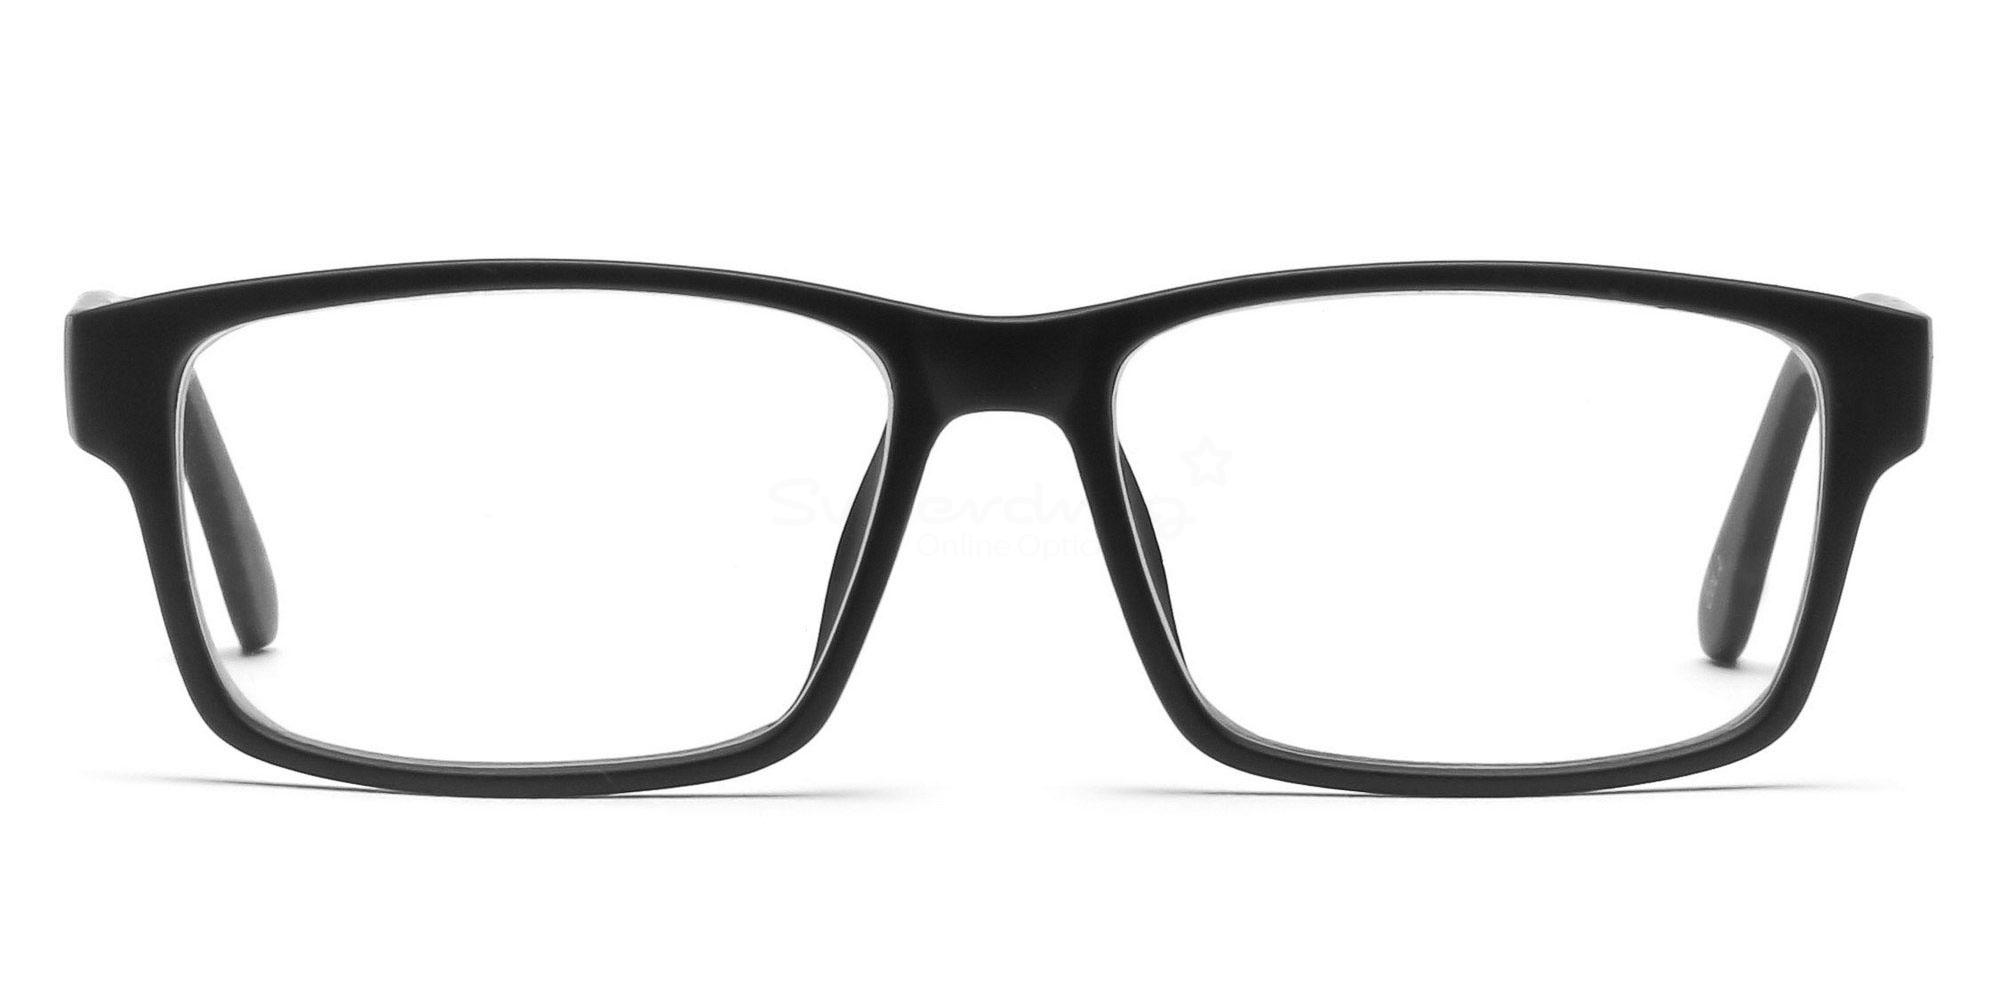 COL.02 2376 - Black Glasses, Helium